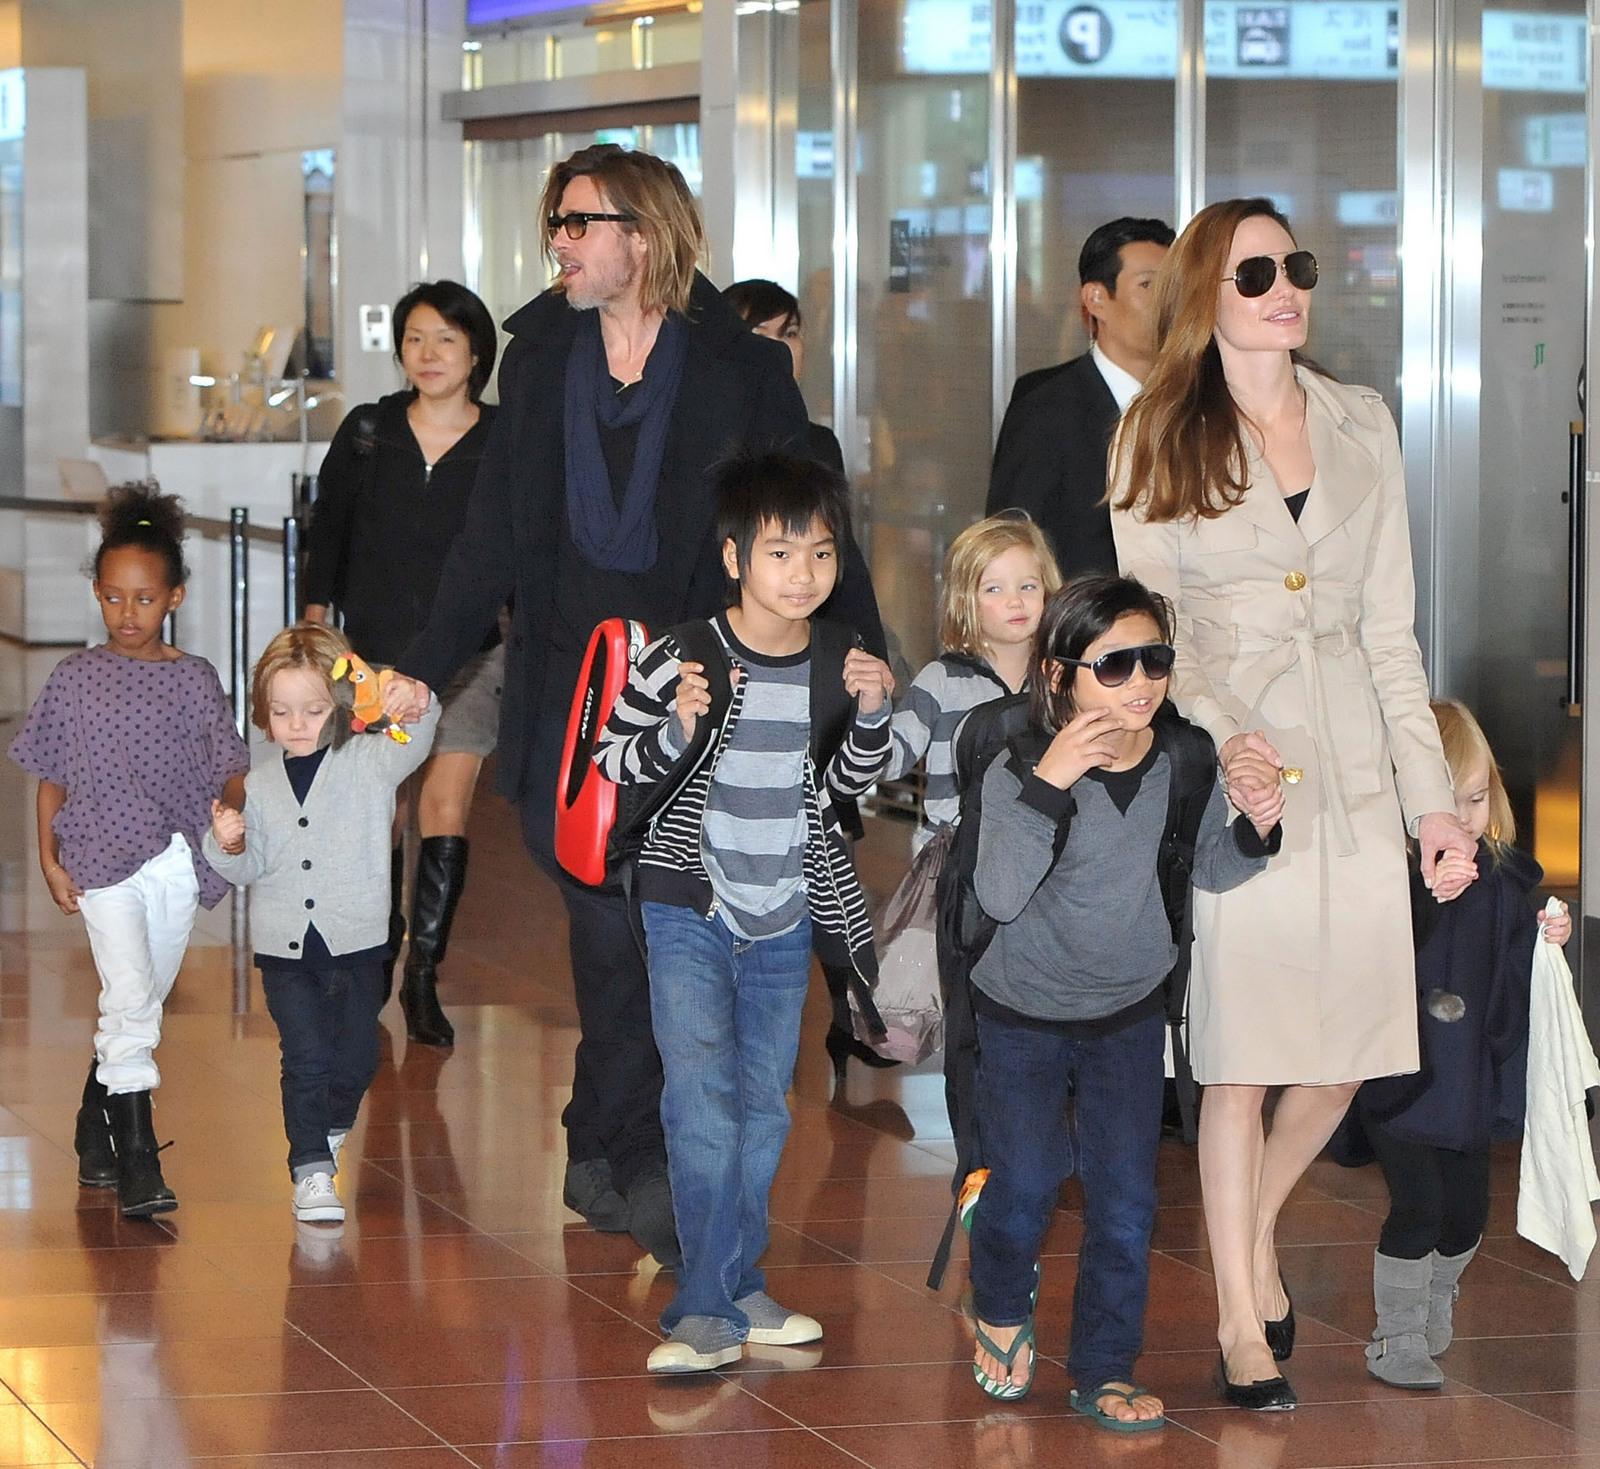 angelina jolie brad pitt kids bowling traveling jealous new movie